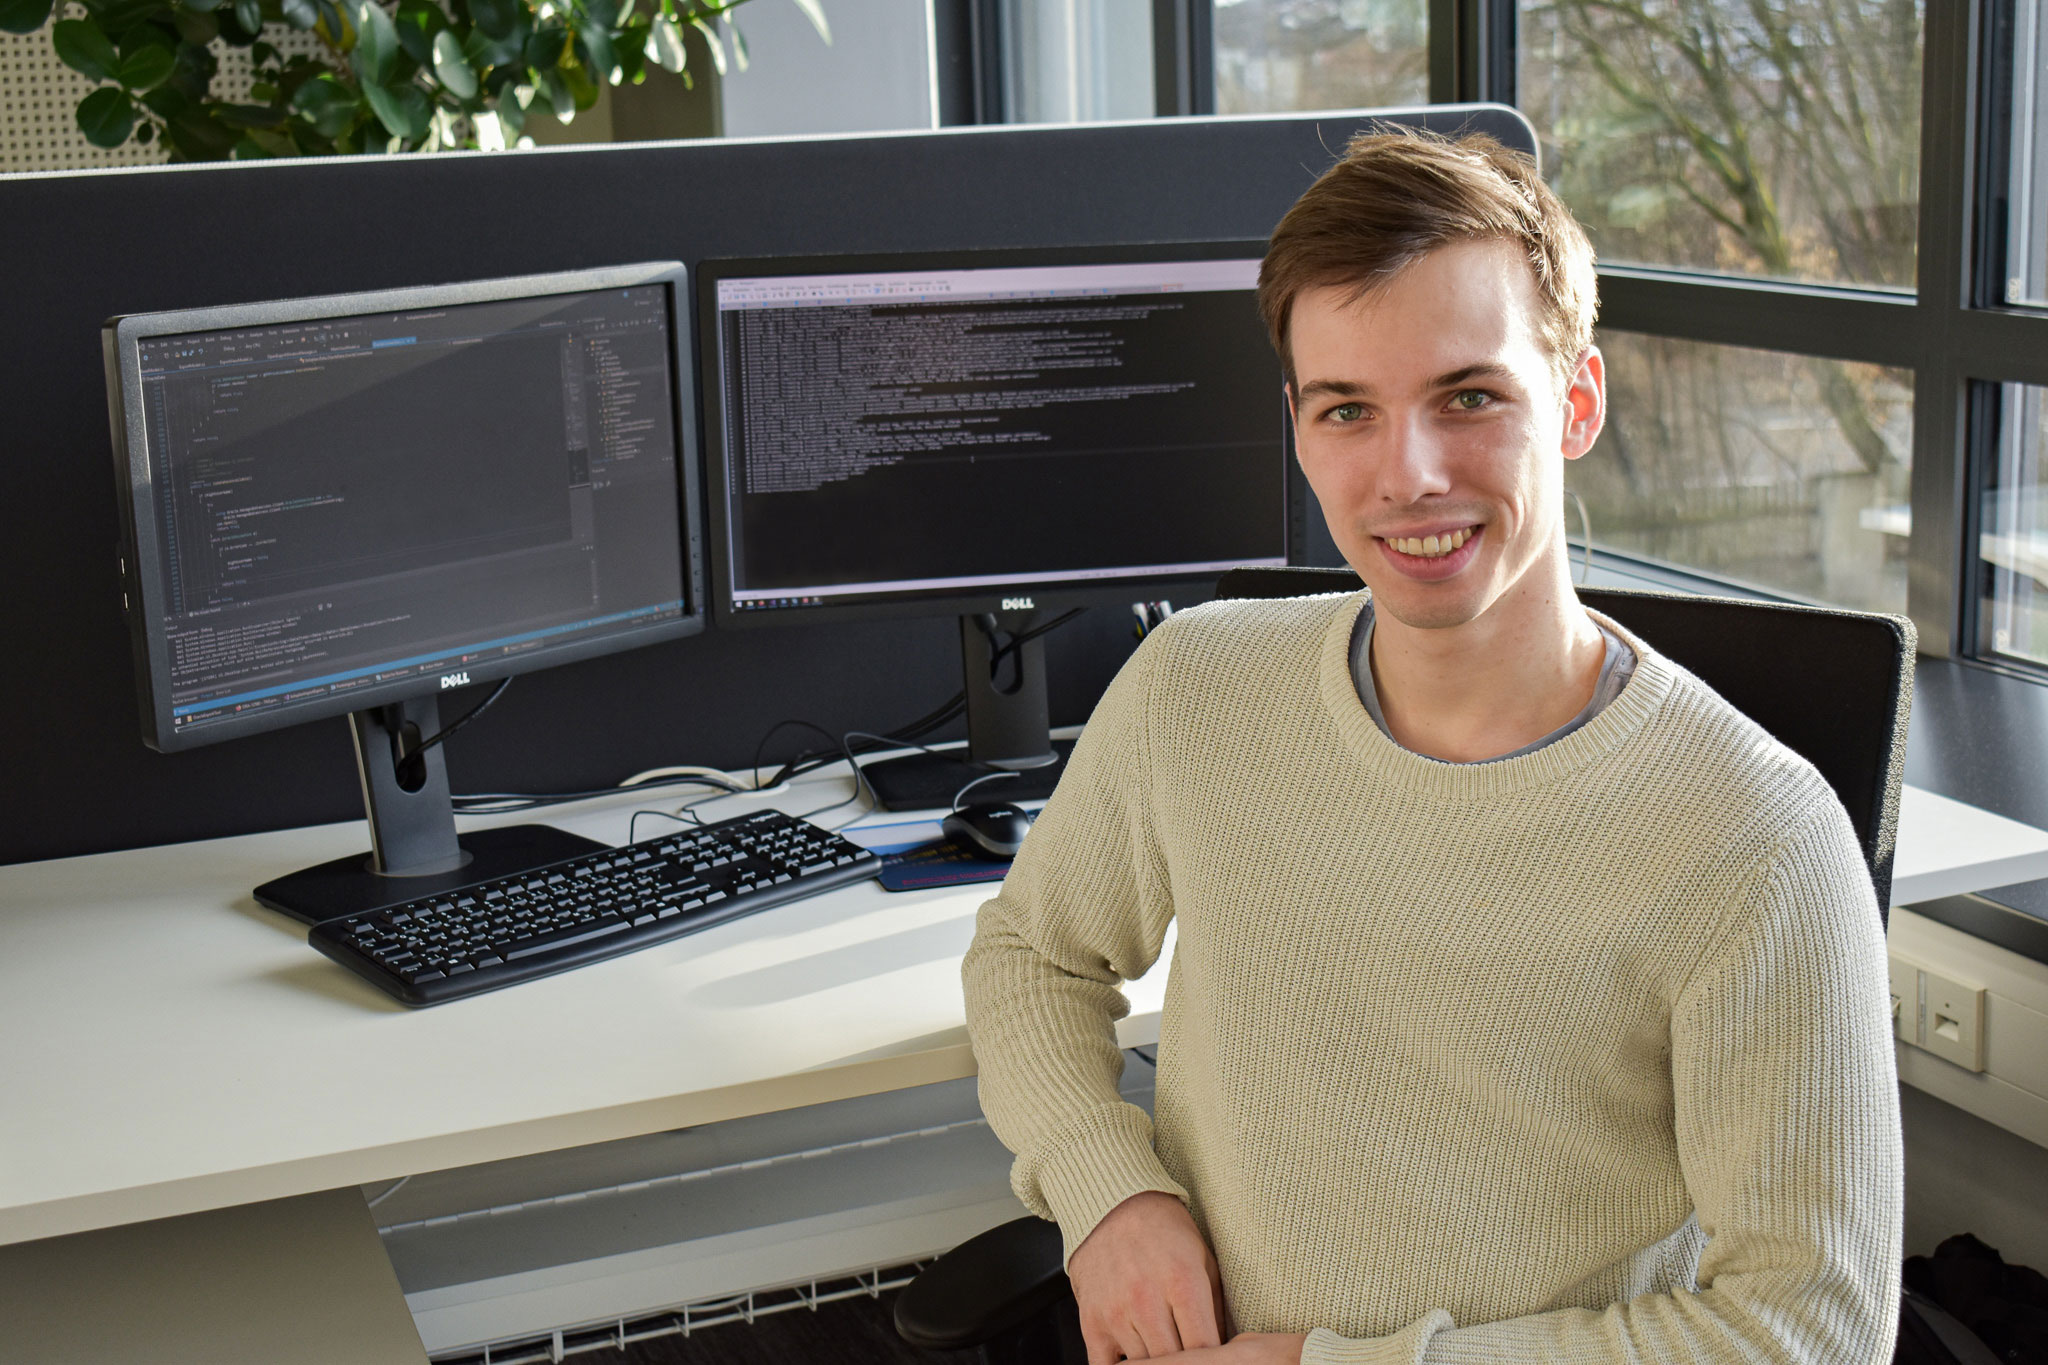 Anwendungsentwicklung Karriere Soloplan Topjobs